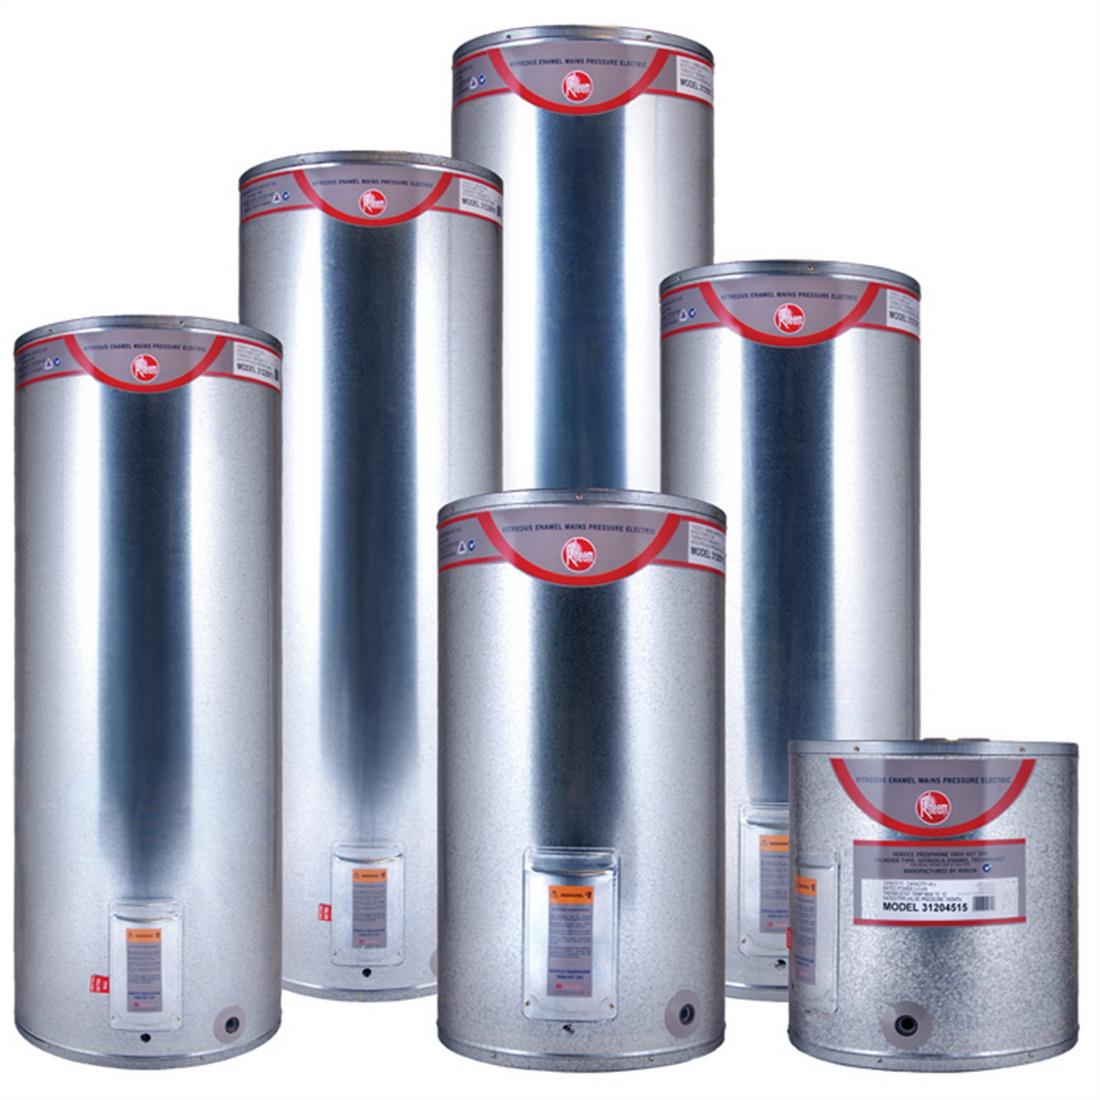 Rheem Mains Pressure Electric Hot Water Cylinder 250L 580 x 1560mm 3kW Vitreous Enamel 31225015